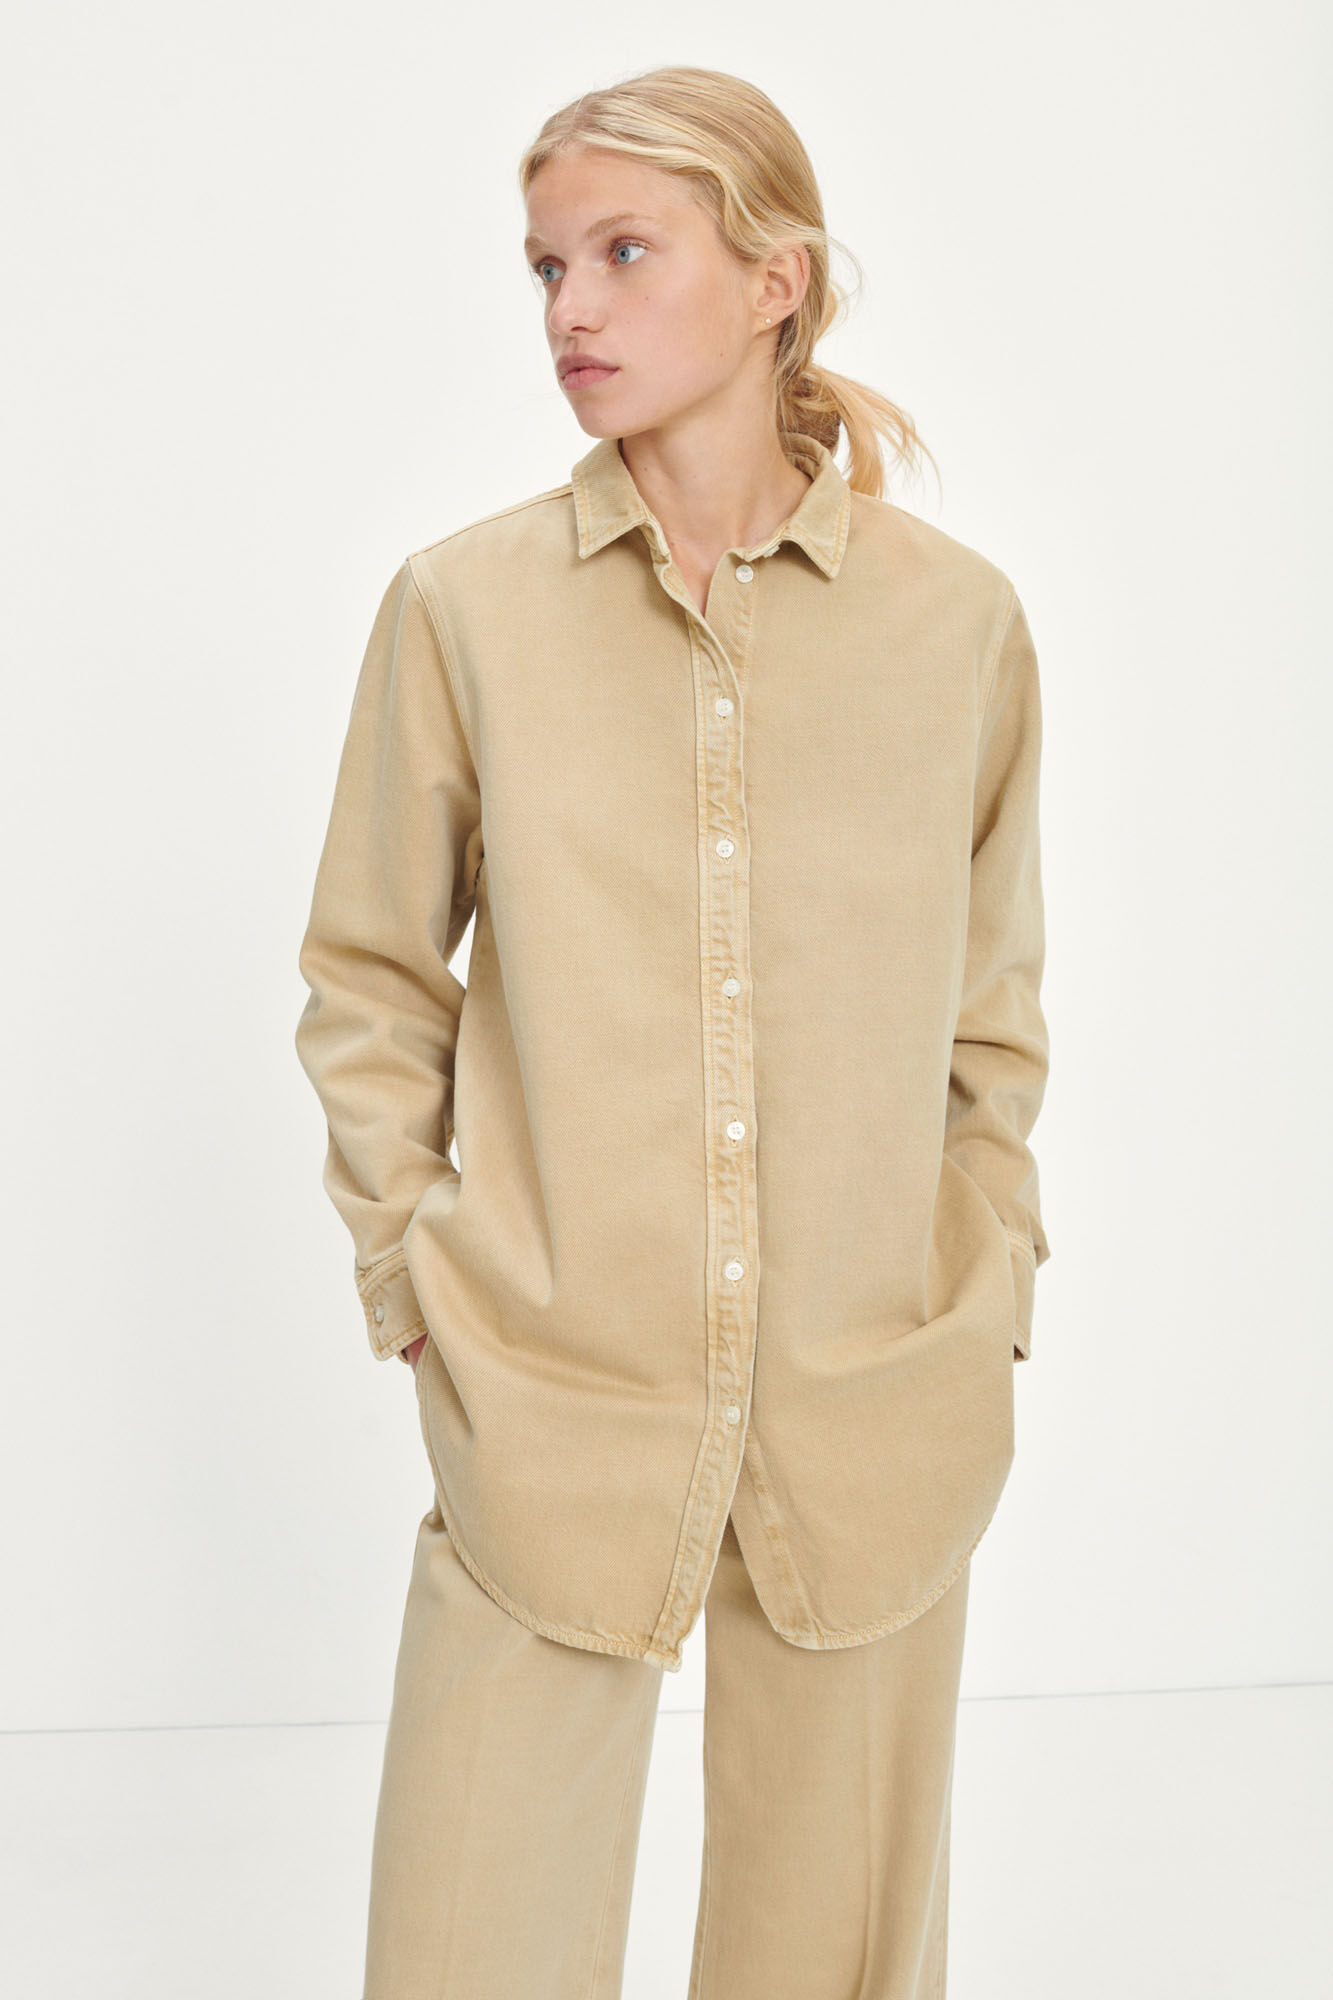 Collot shirt 13143